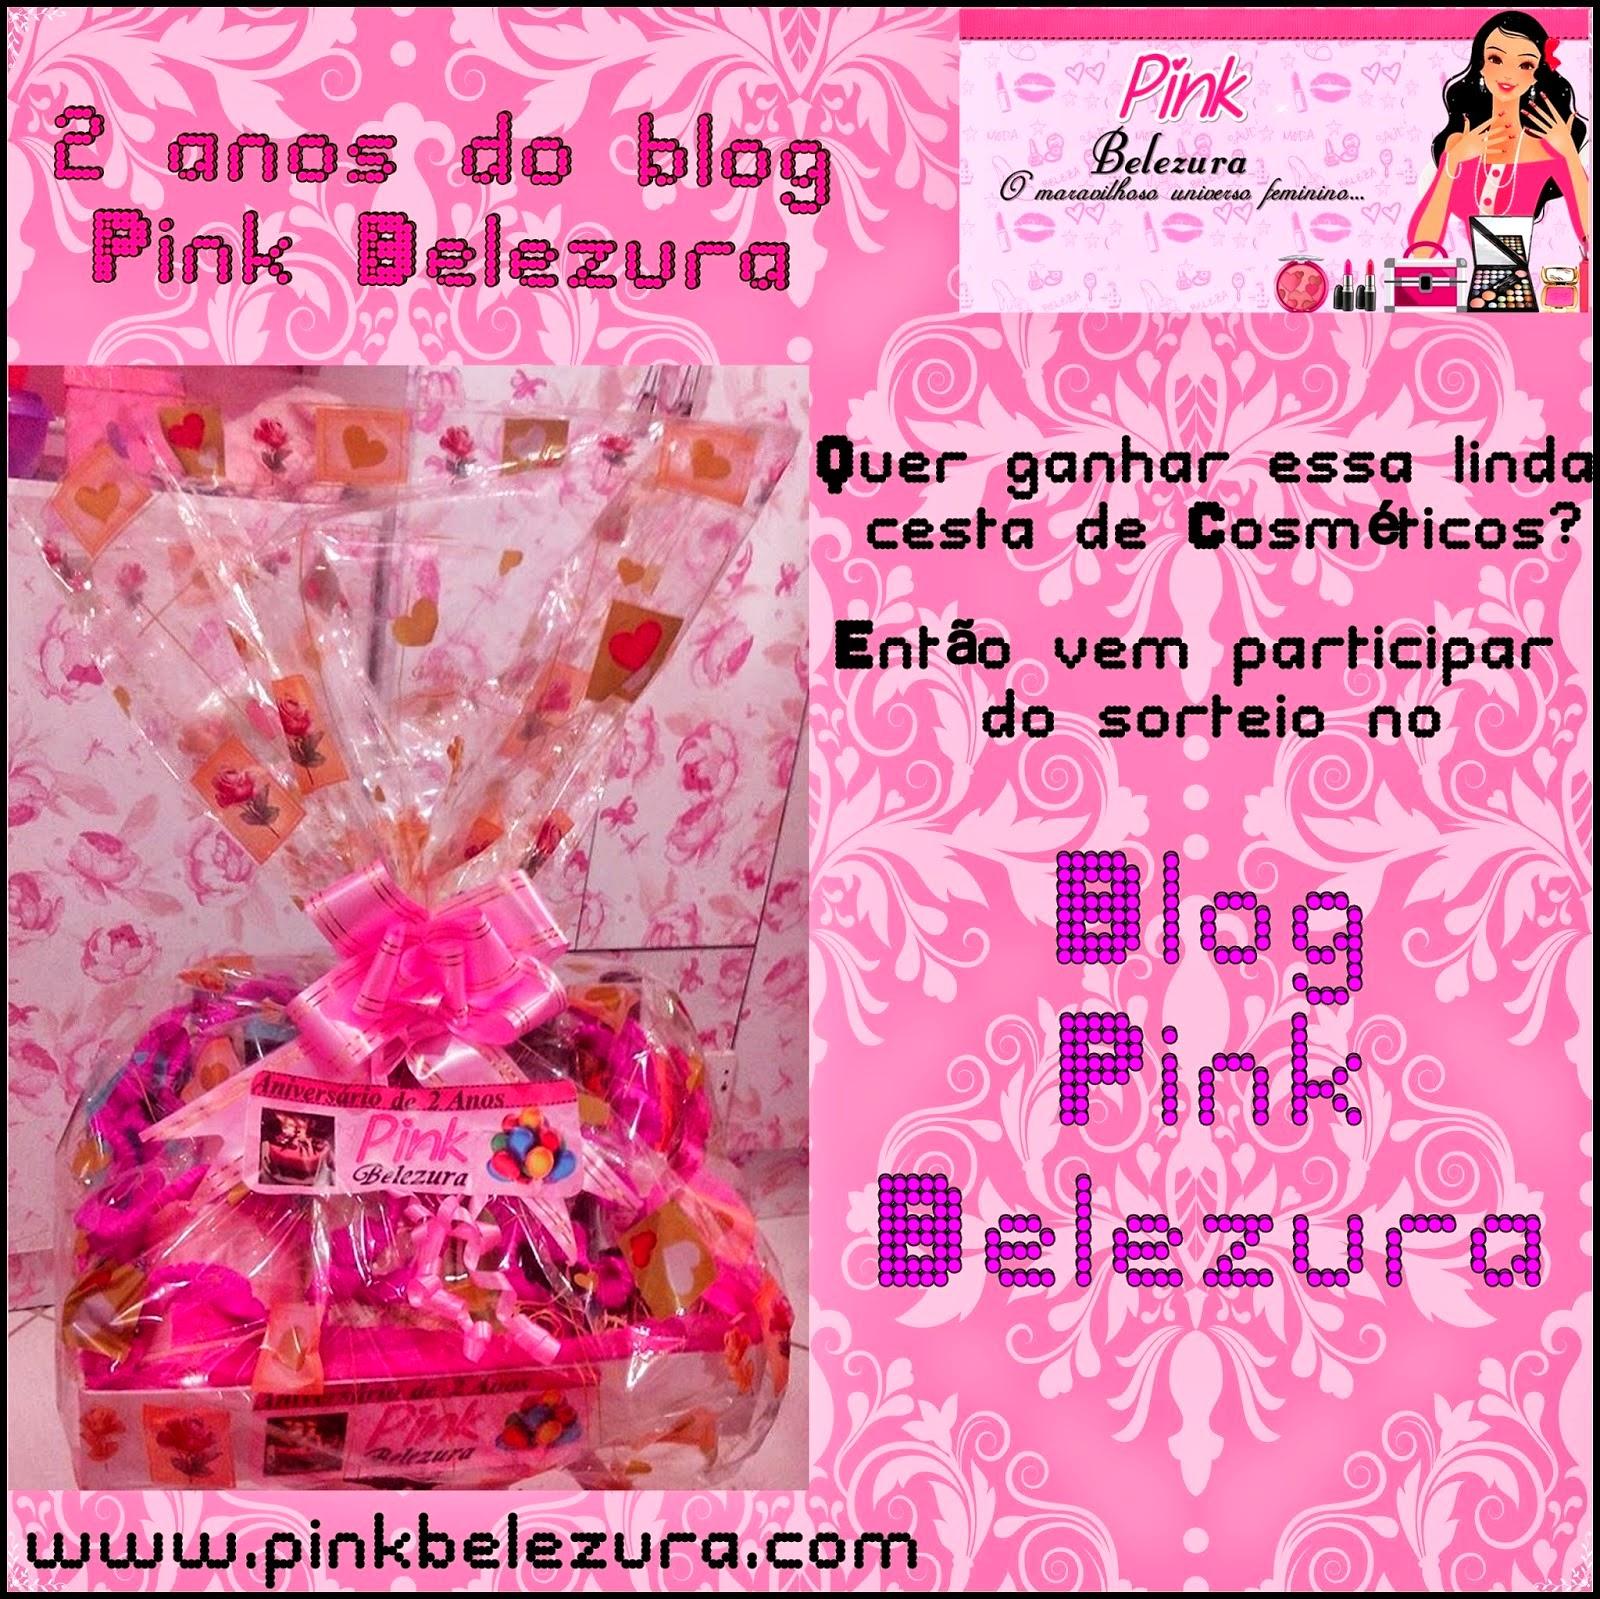 http://www.pinkbelezura.com/2014/05/blog-pink-belezura-sorteio-de.html